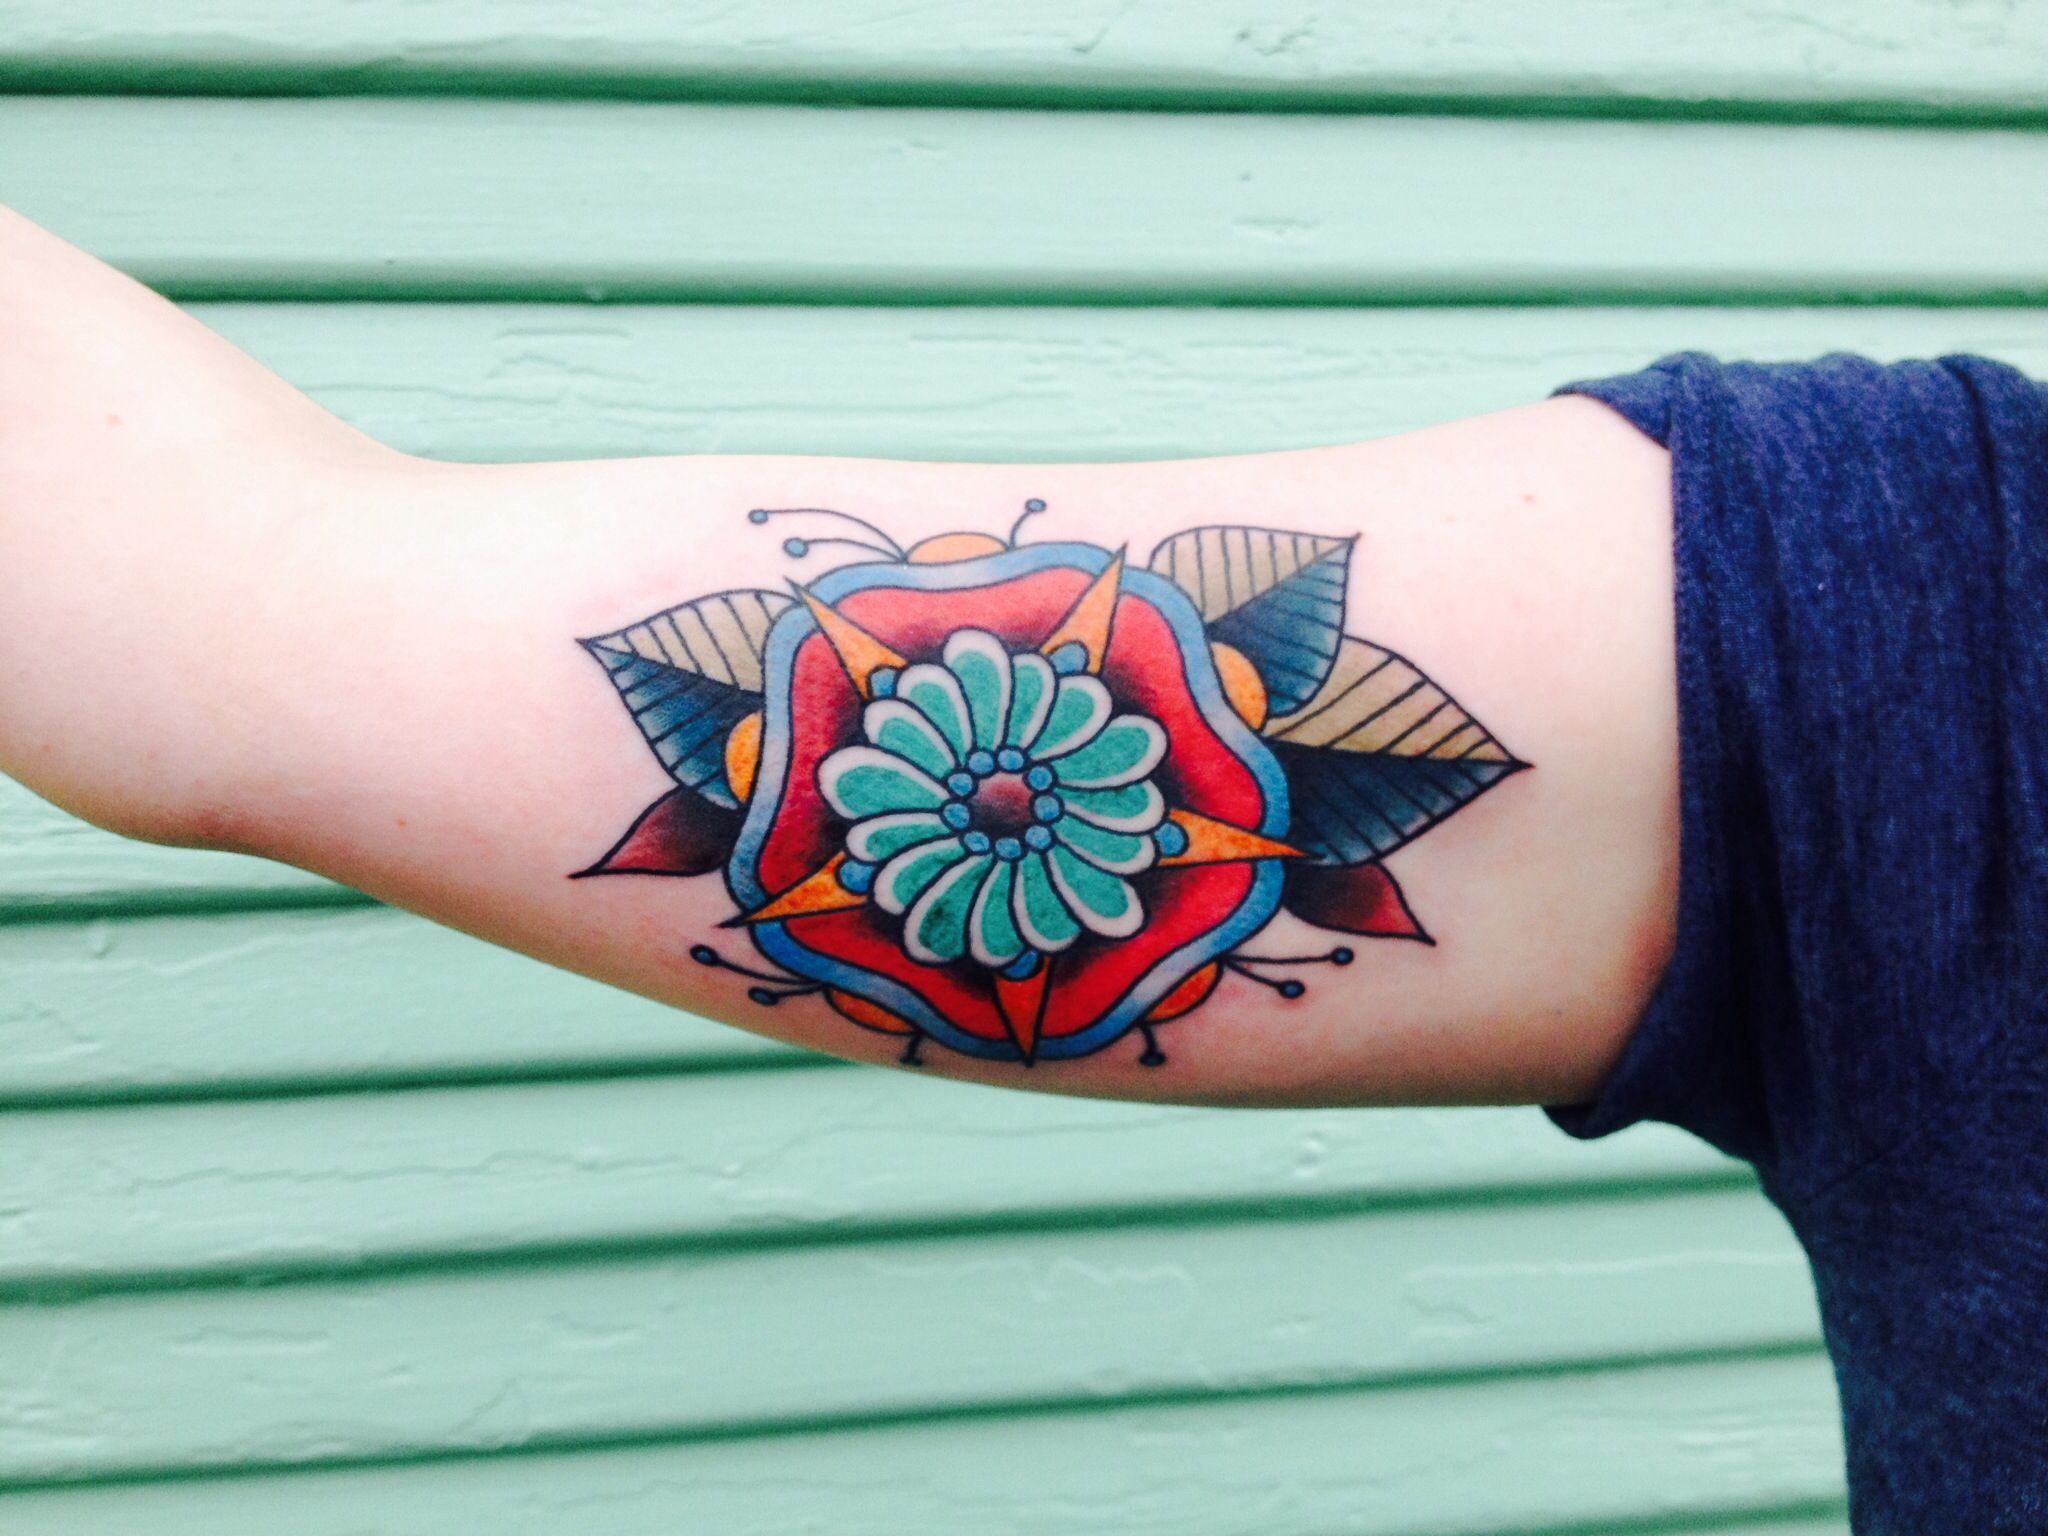 My traditional flower mandala done by Alana Robbie Freaks and Geeks Tattoo